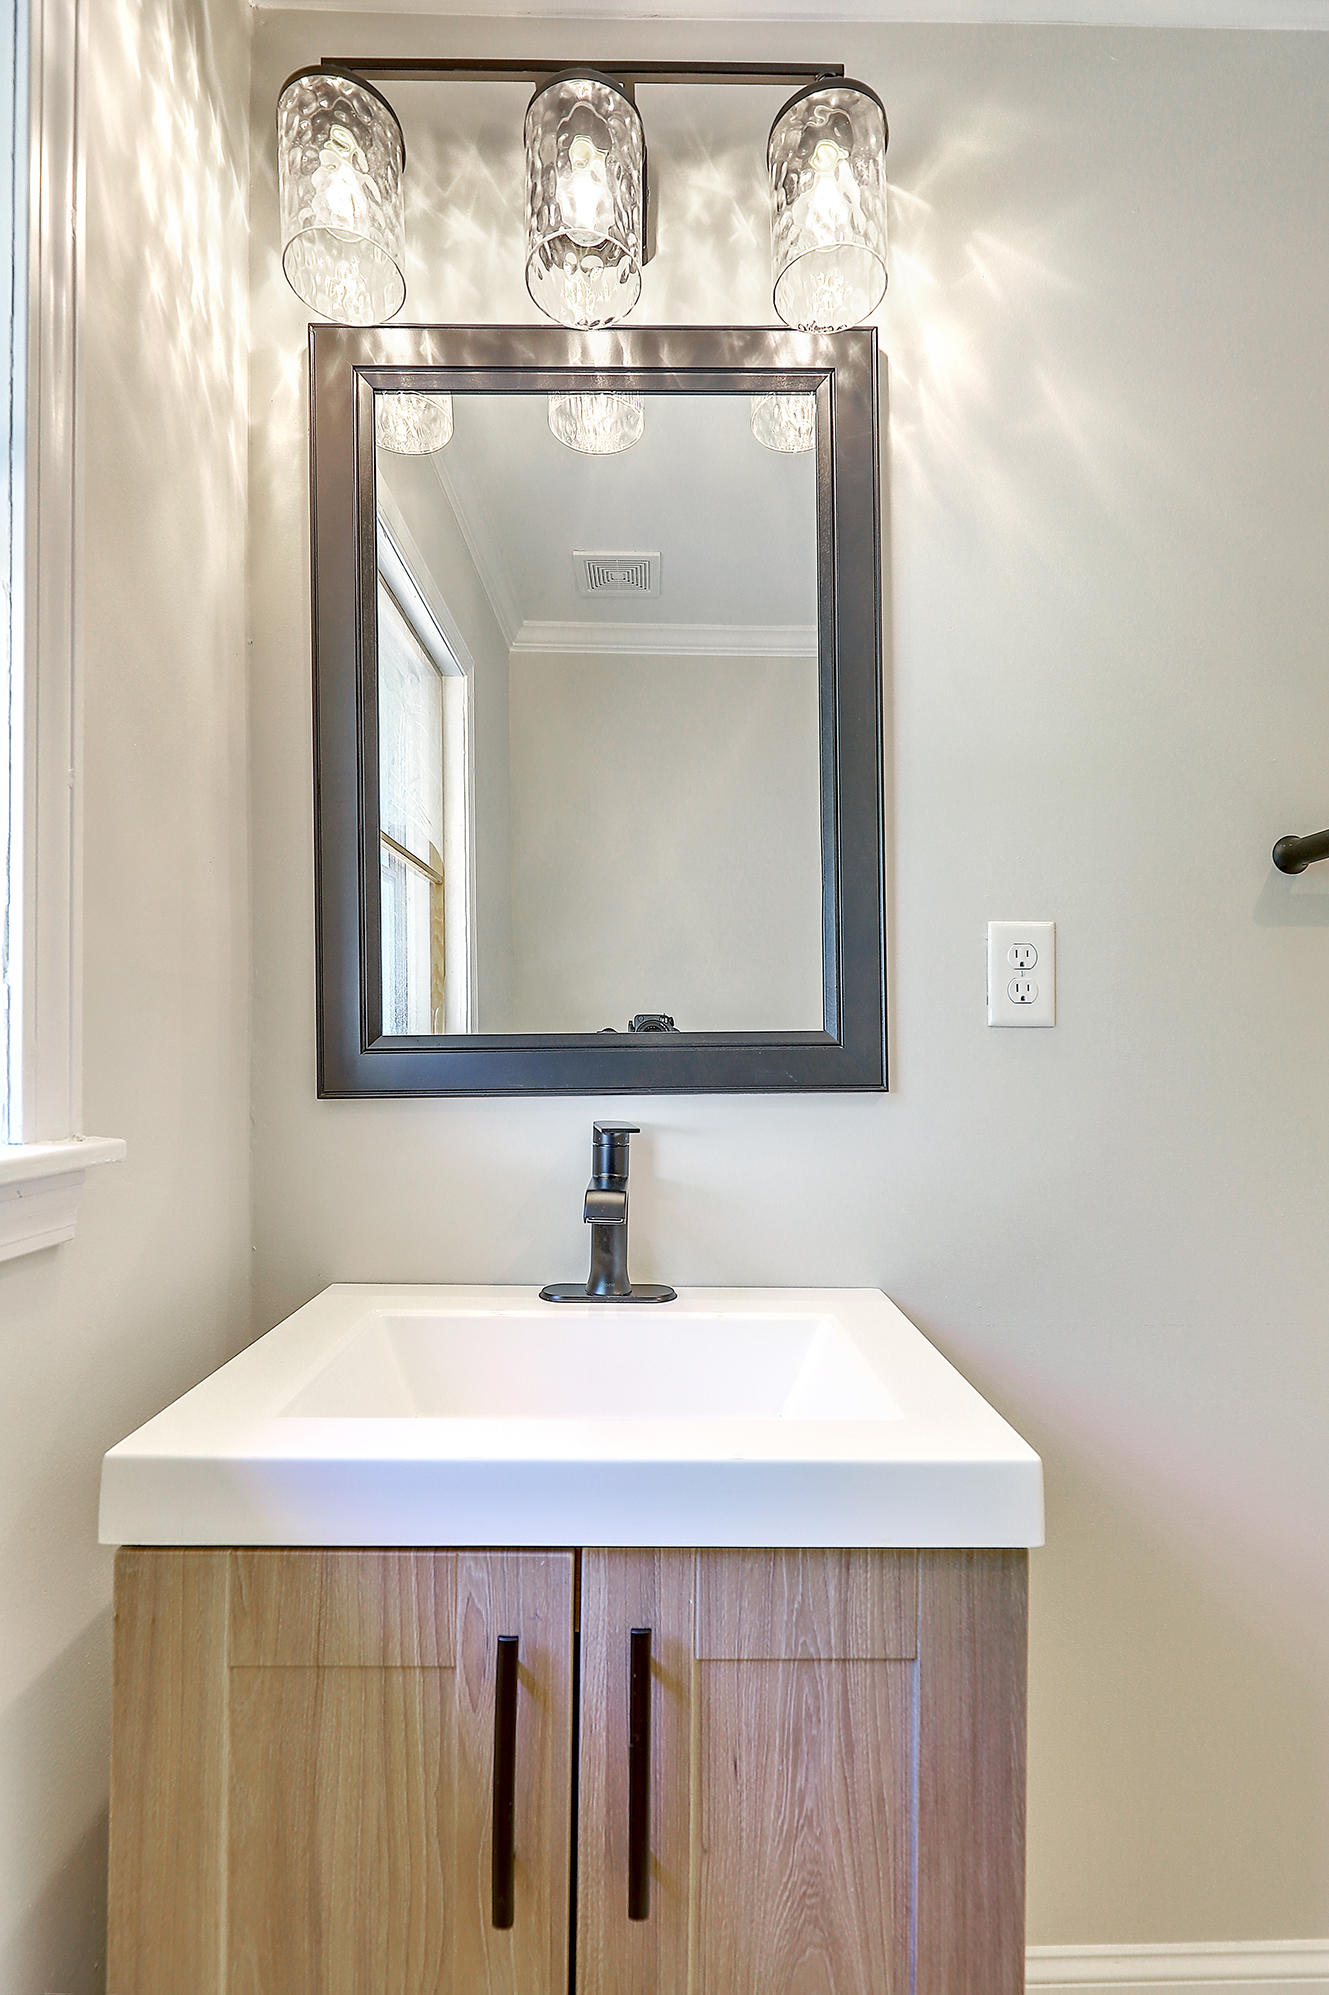 Lawton Bluff Homes For Sale - 847 Quail, Charleston, SC - 11